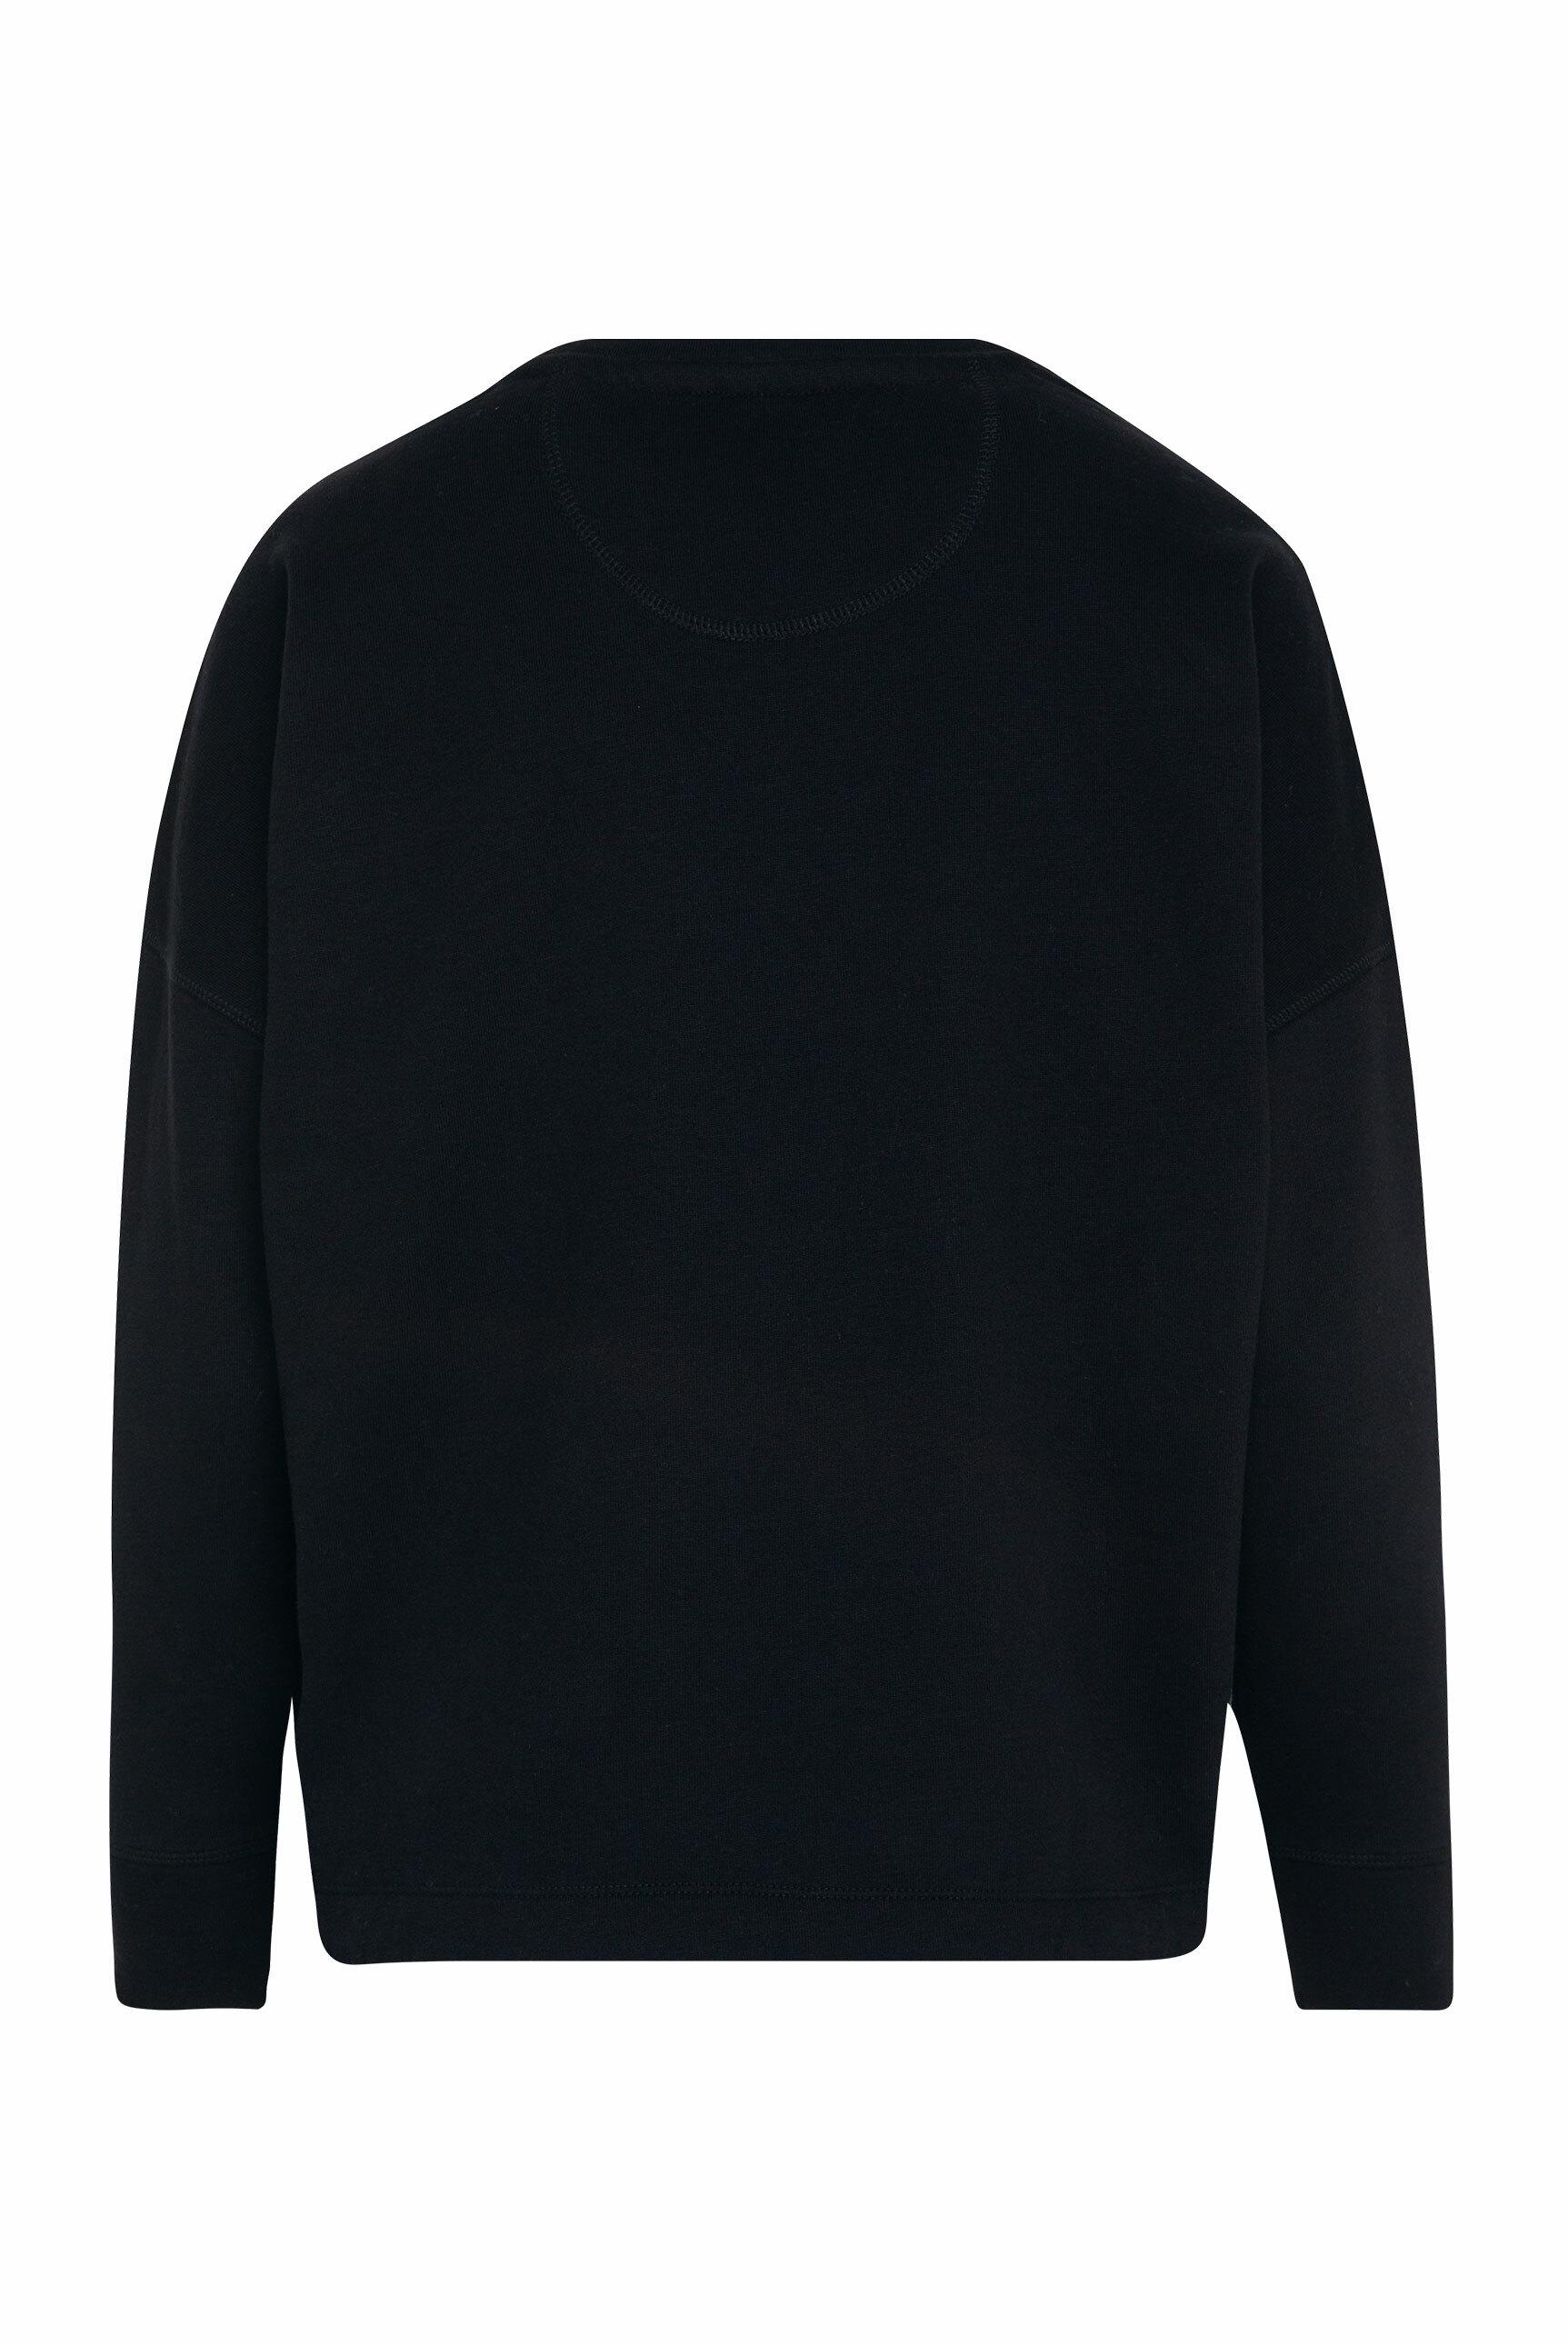 Logo-Sweatshirt mit Bindeband im Saum